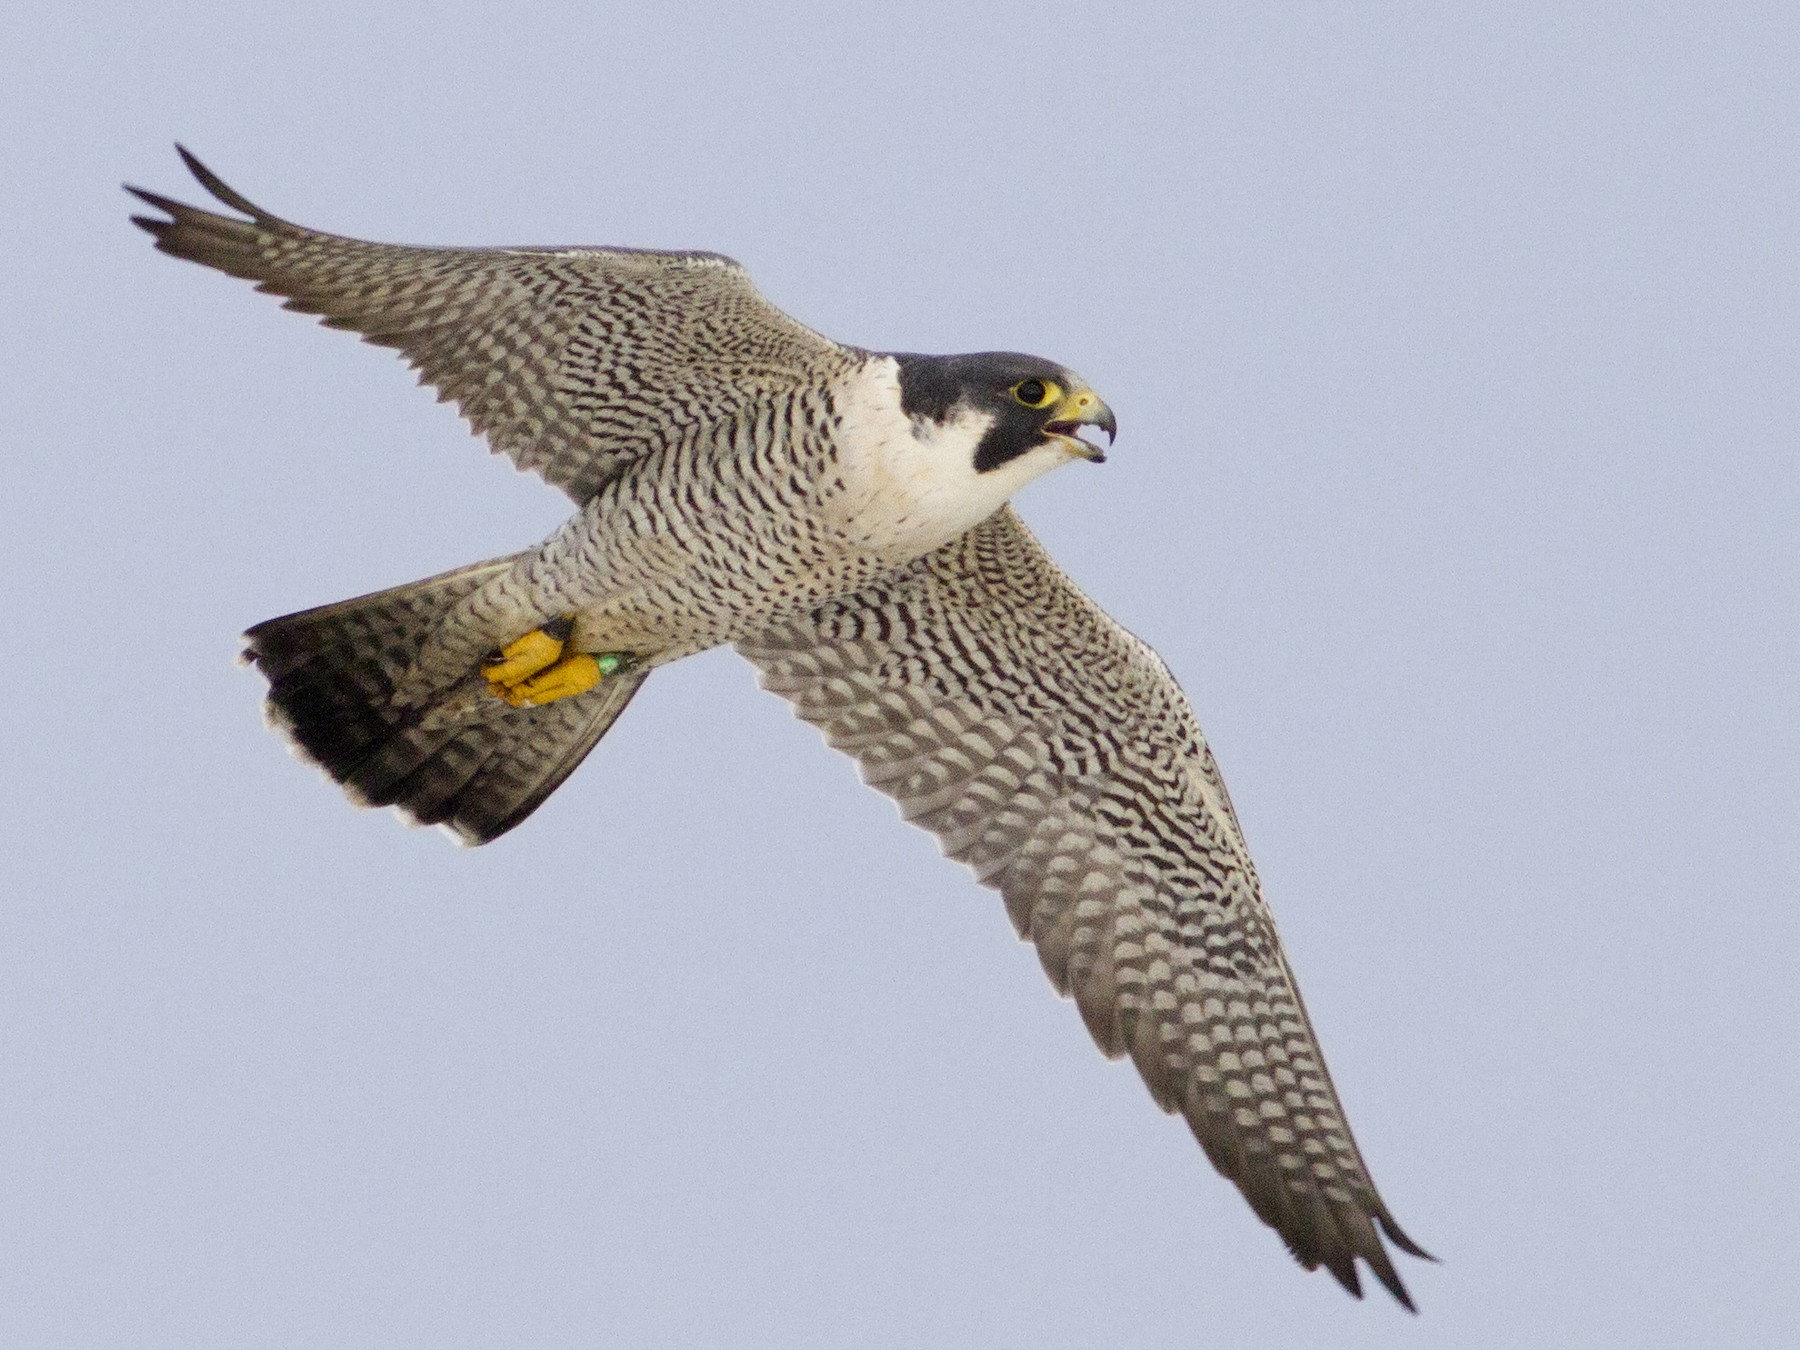 Peregrine Falcon - Samuel Paul Galick